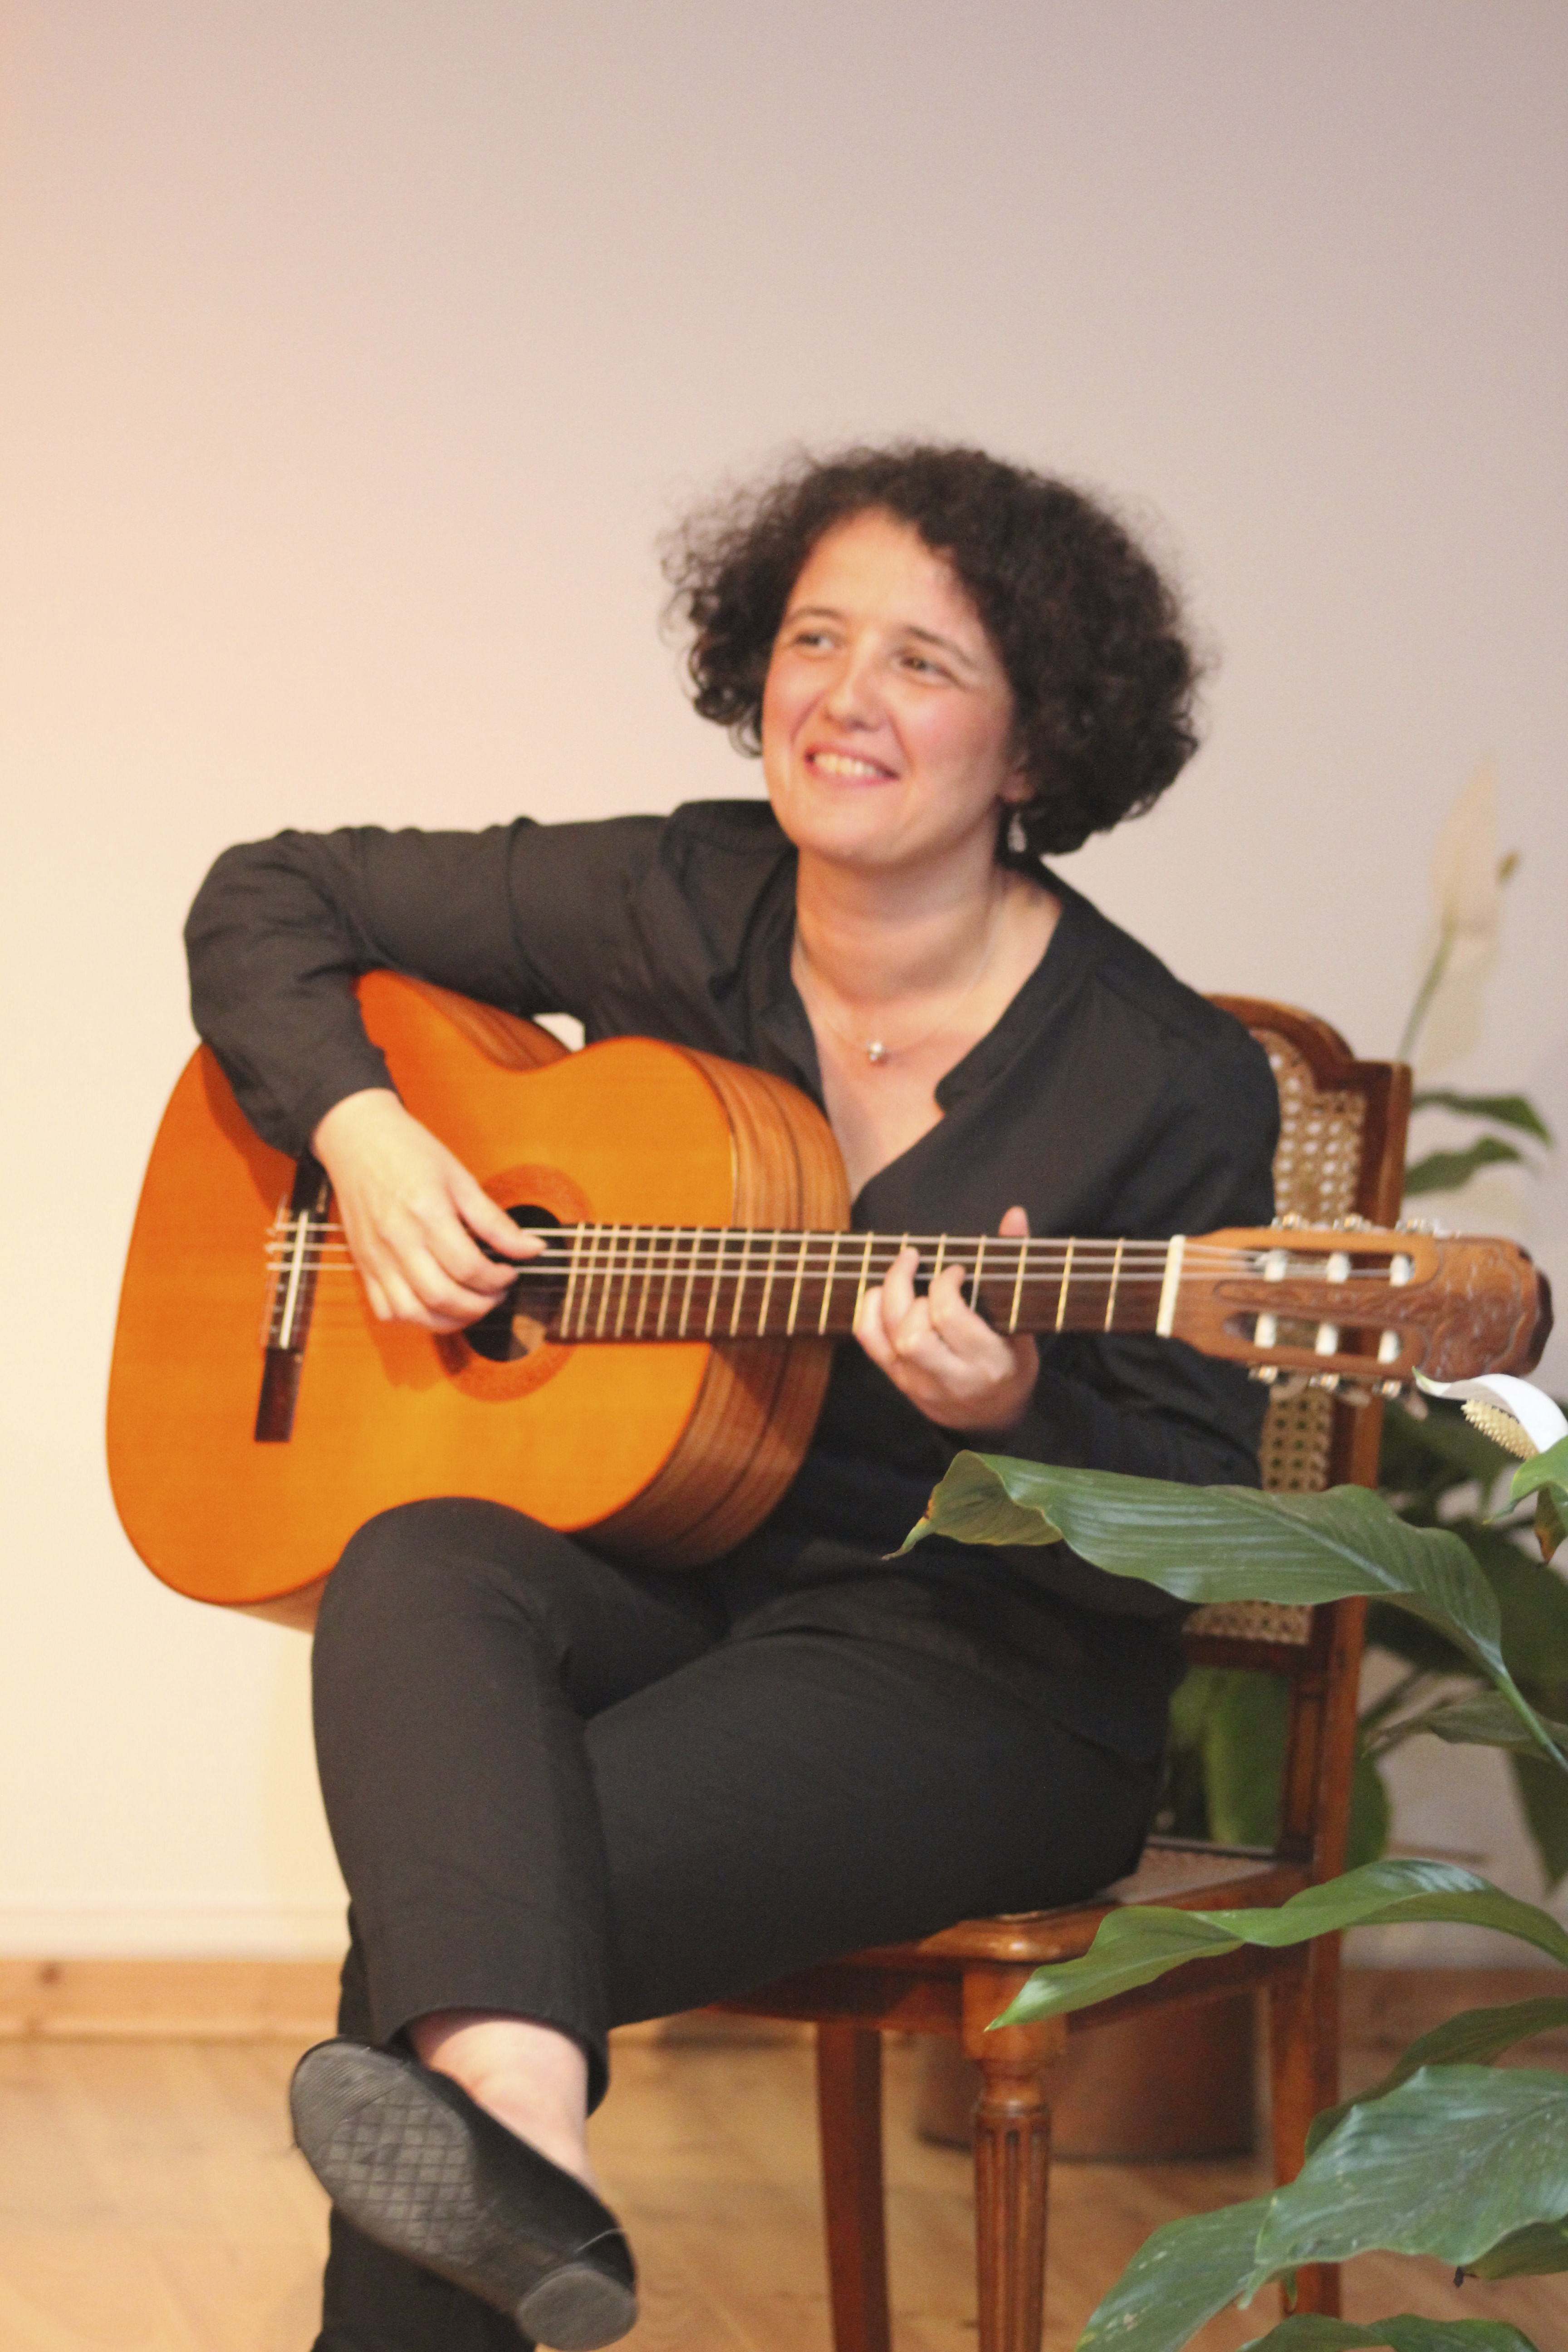 Muriel Boccara